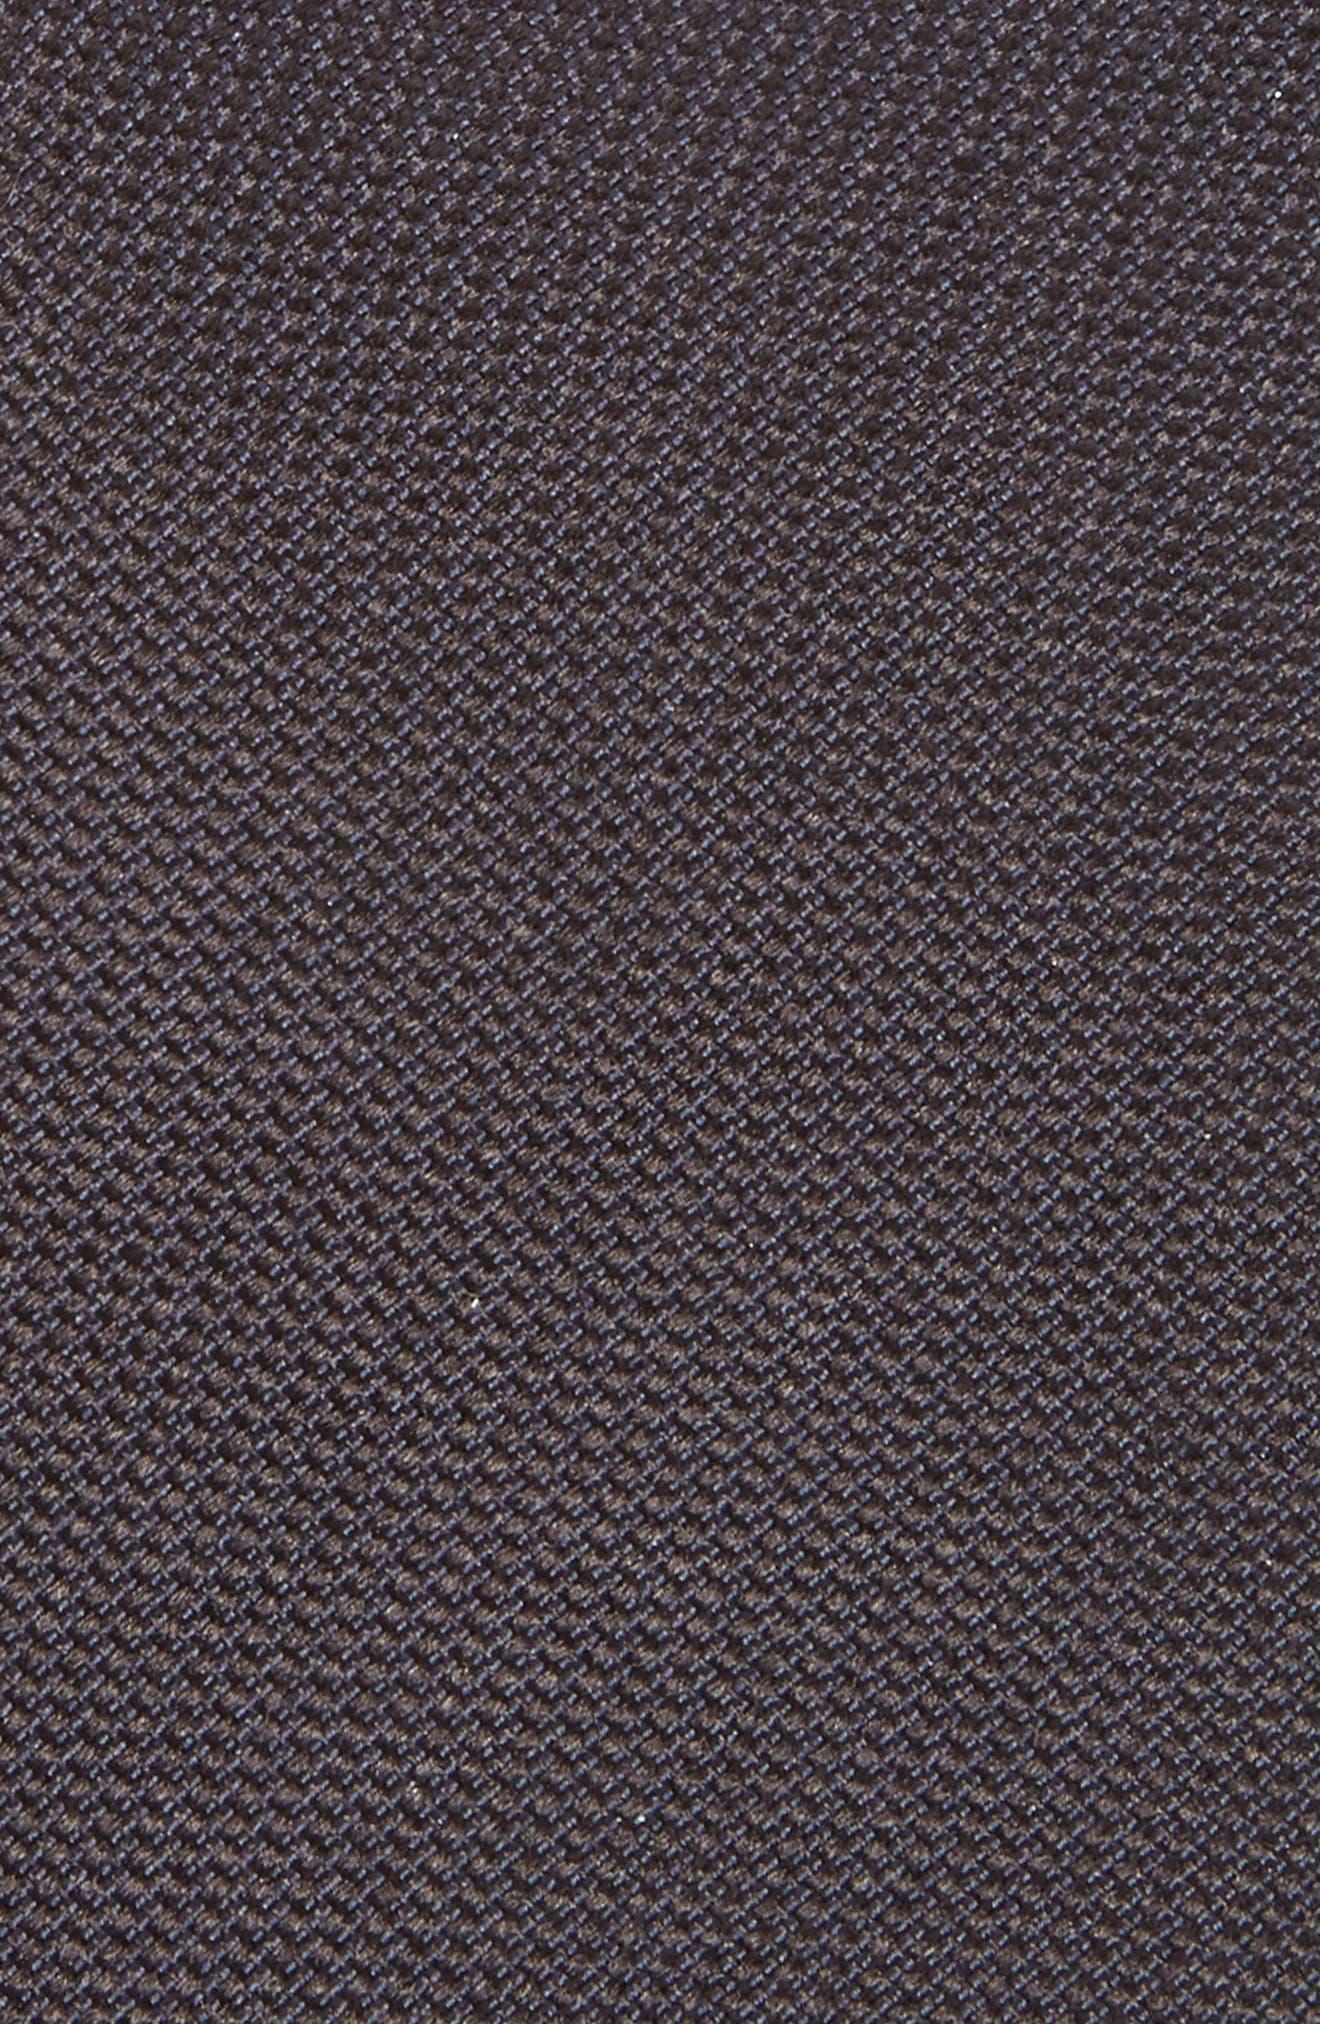 Nordstrom x BOSS Silk Tie,                             Alternate thumbnail 2, color,                             Blue